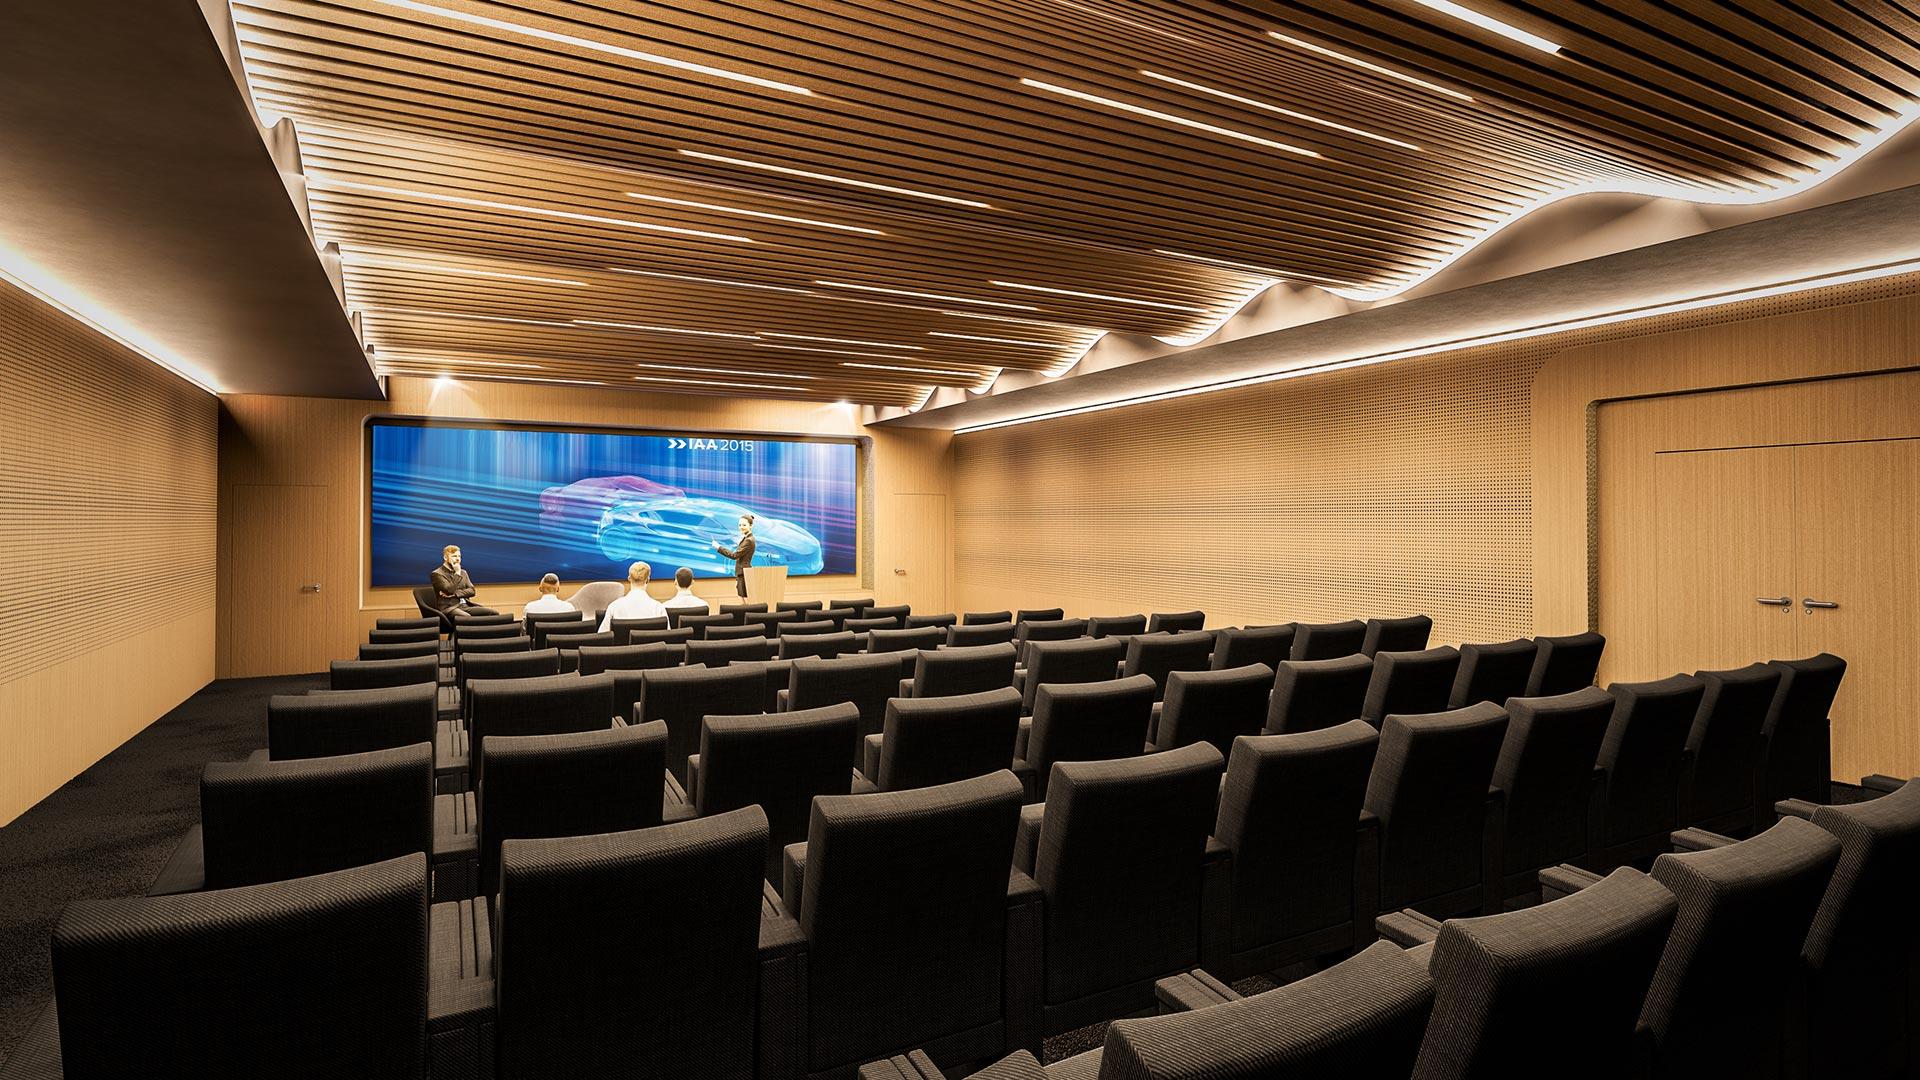 auditorium grand ecran plafond vague